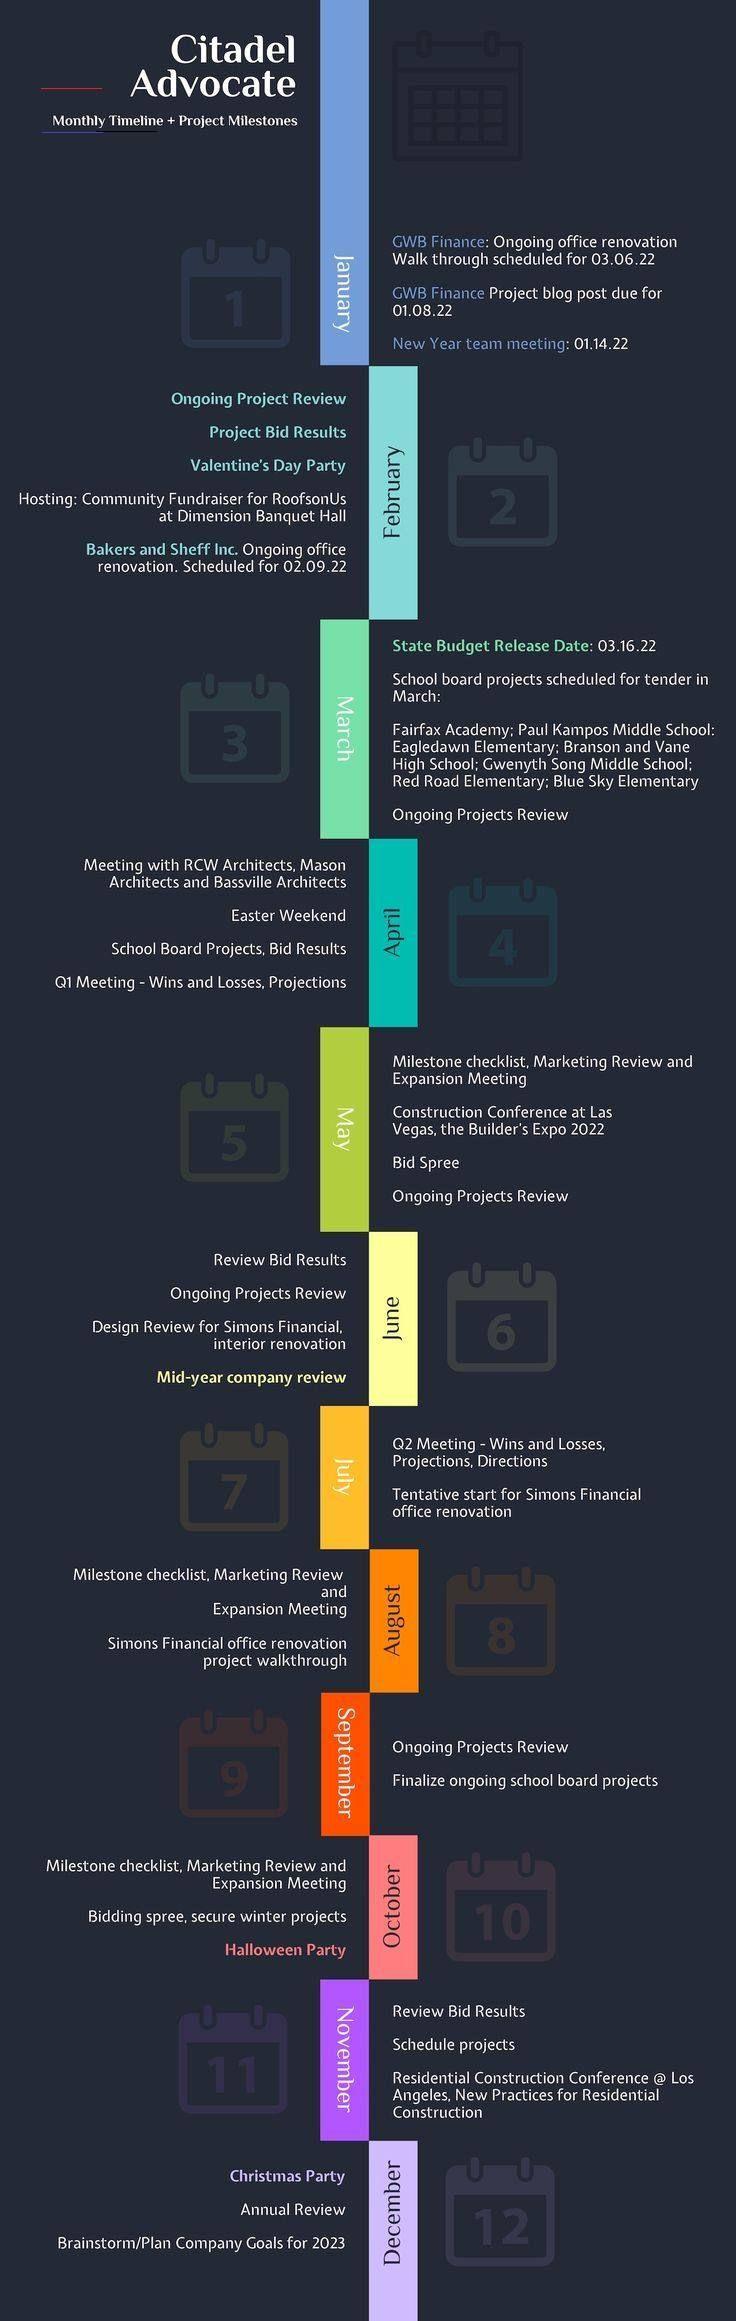 Infografias #Design, #Tipos #Infografias, #Ejemplos #Infografias #- #15+ #Timeline #Infograph... Infografias #Design, #Tipos #Infografias, #Ejemplos #Infografias #- #15+ #Timeline #Infographic #Design #Examples #& #Ideas #// #Simple #Colorful #Business #Timeline #Infographic #Template,  #business #colorful #DESIGN #Ejemplos #EXAMPLES #IDEAS #Infografias #infographic #simple #template #TIMELINE #Tipos<br>